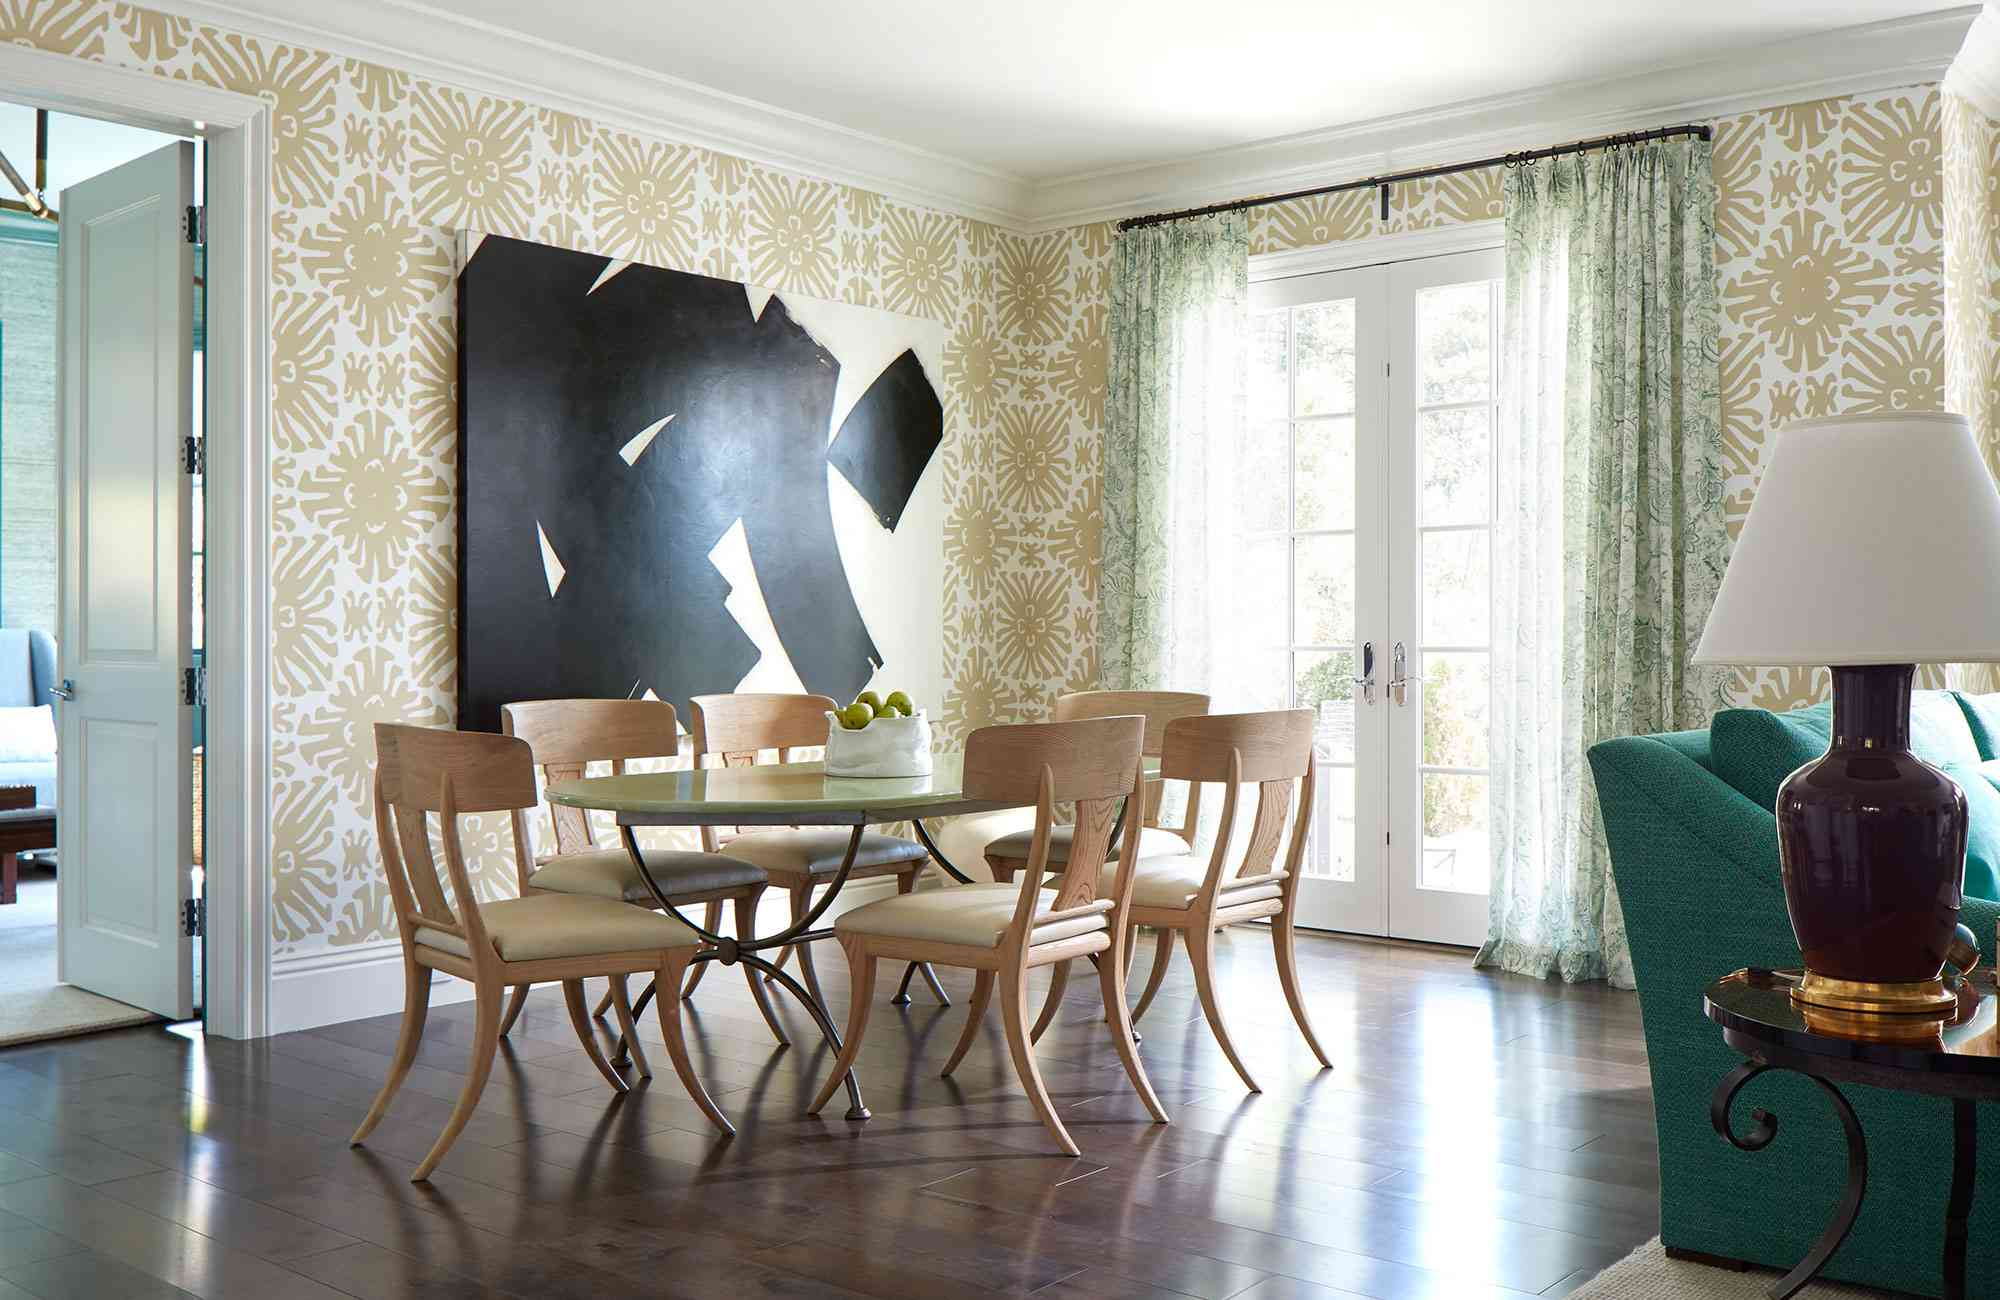 wallpaper chartreuse color